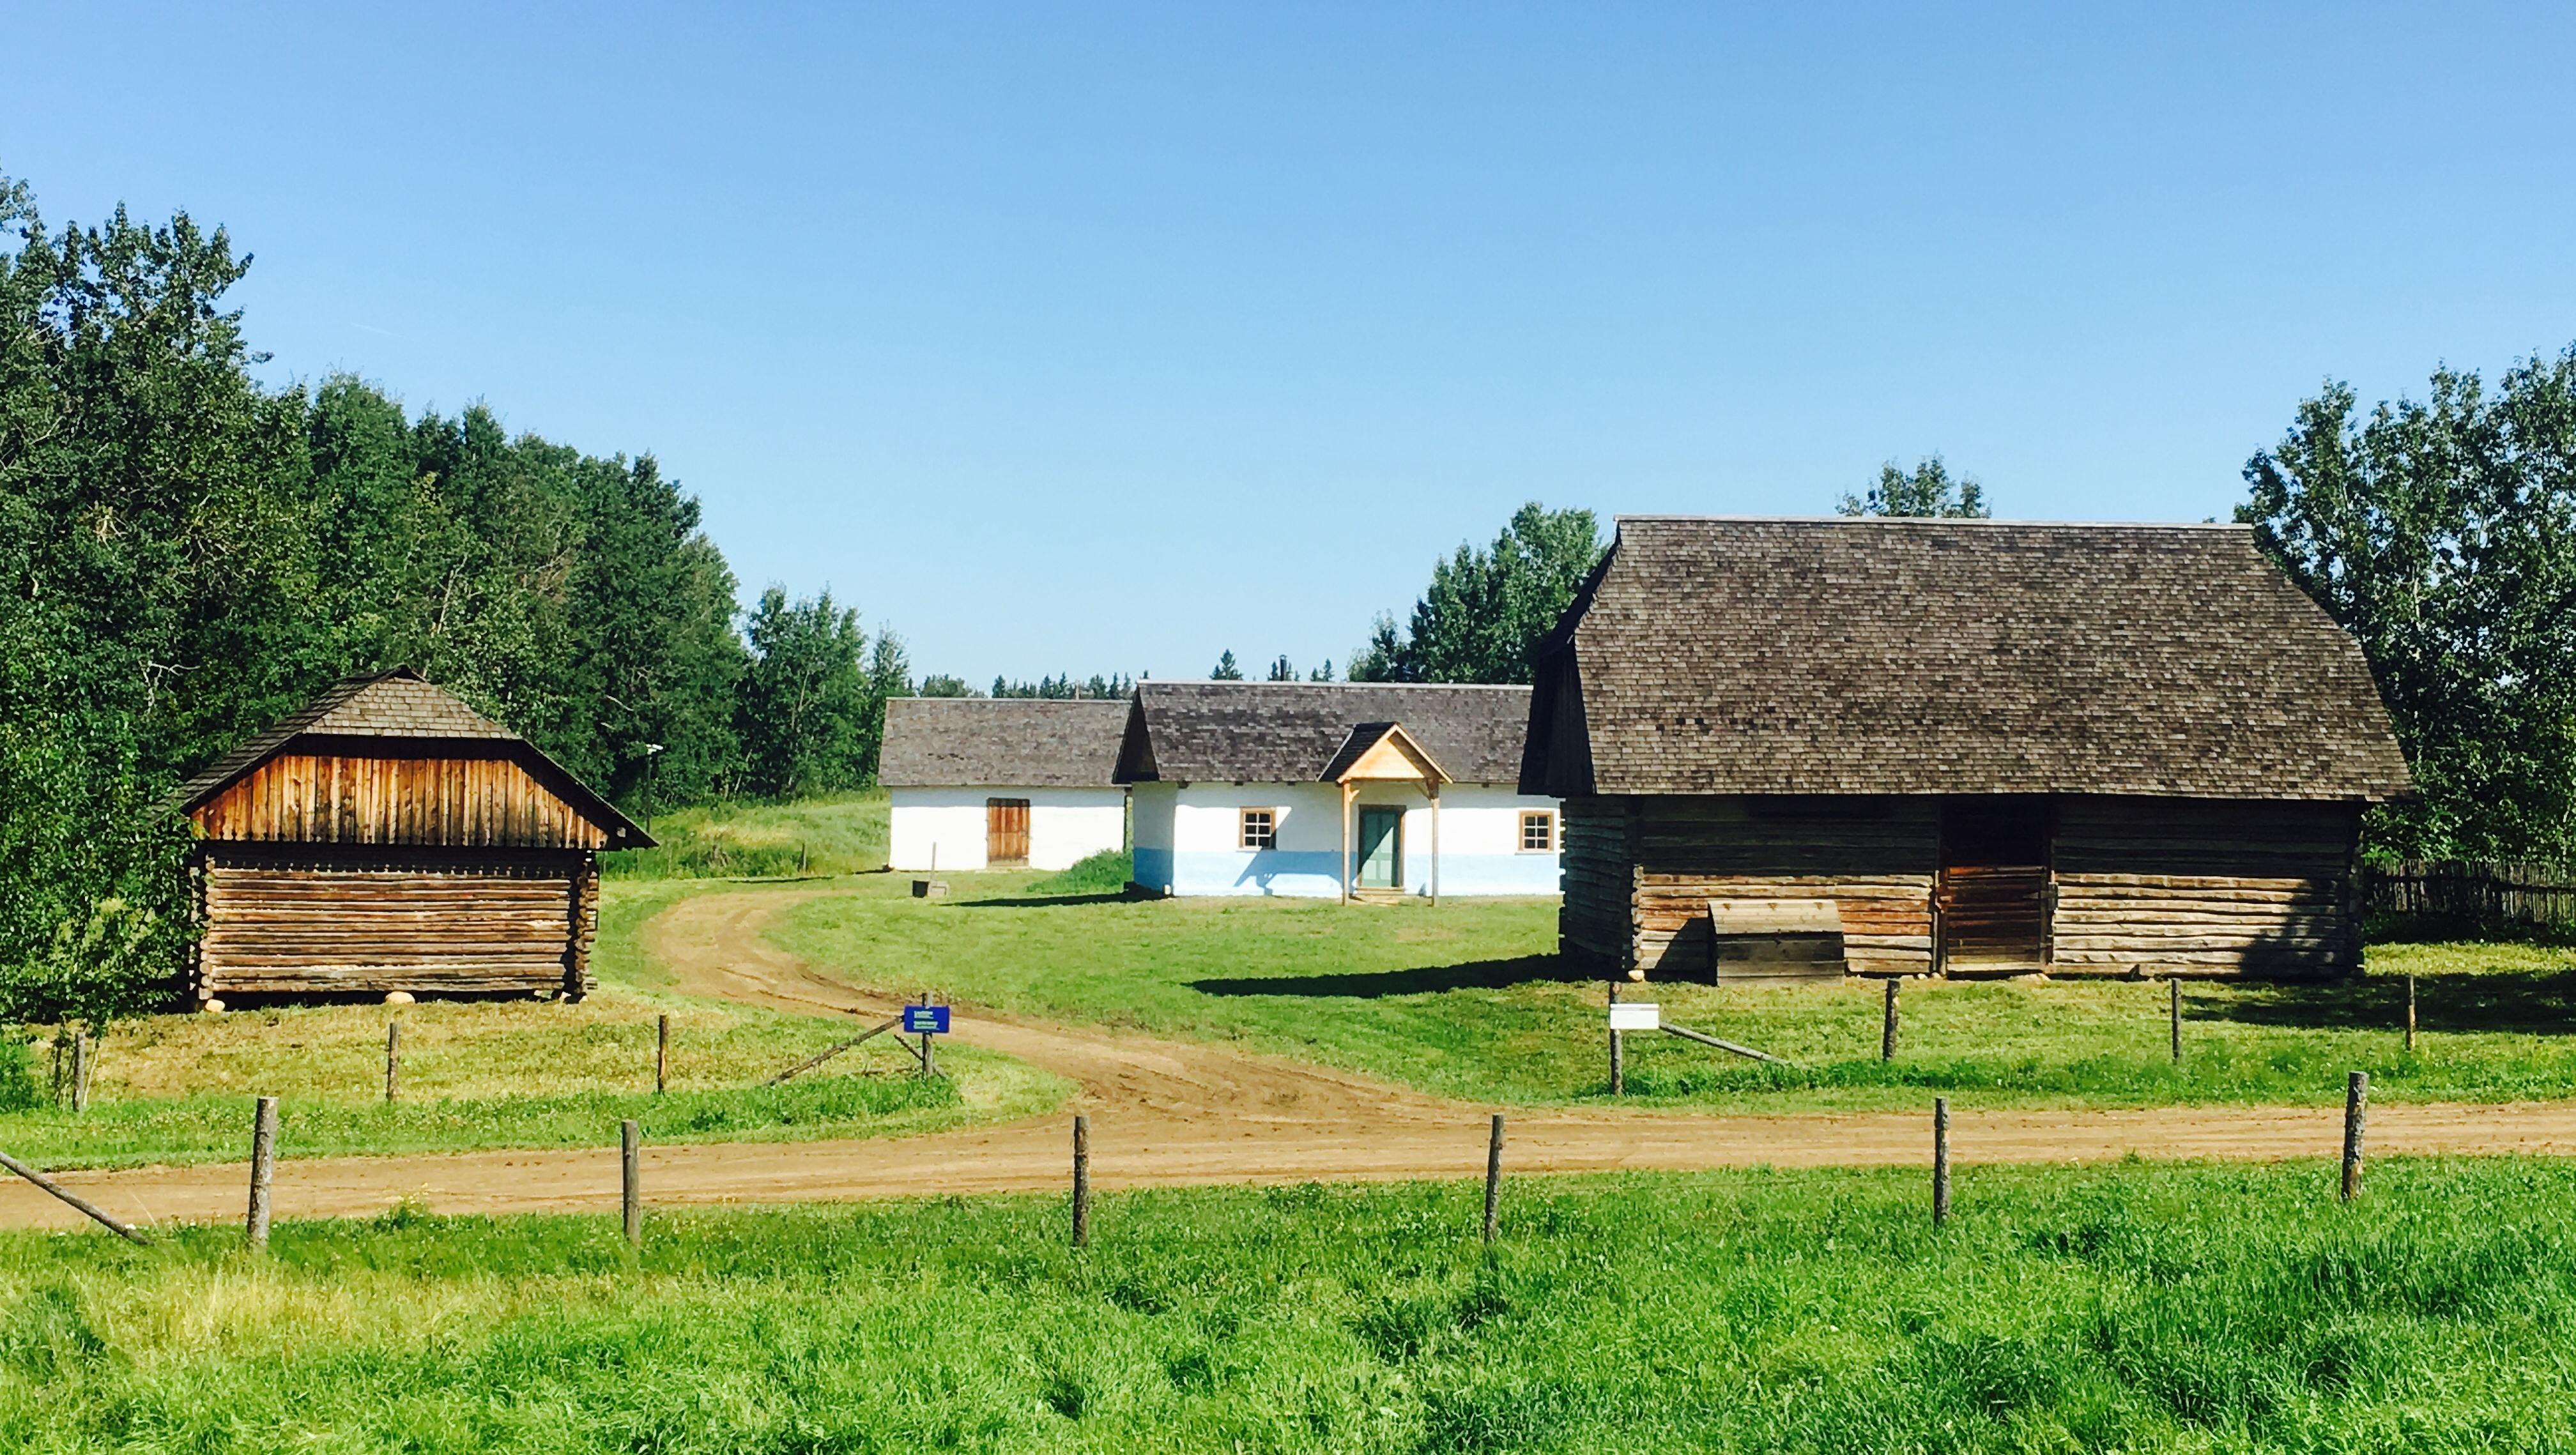 More to See at Ukrainian Cultural Heritage Village - Gateway Gazette